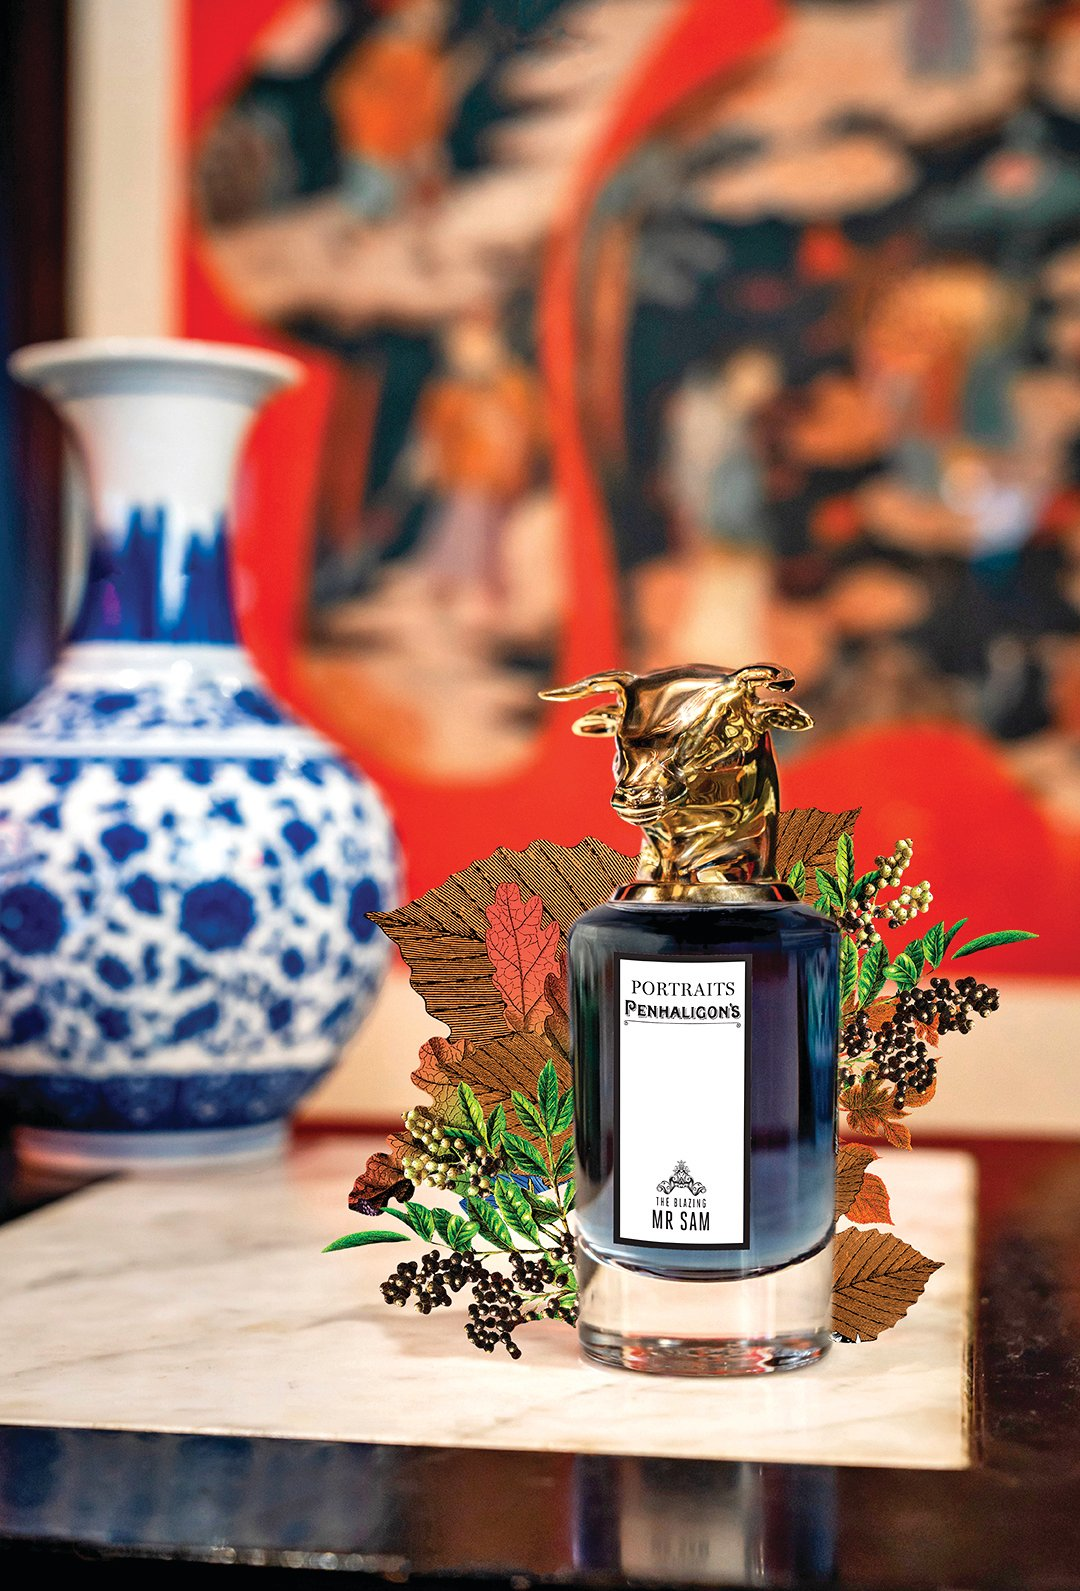 Penhaligon's獸首系列公牛香氛,穩定的松木加入了廣藿香和孜然豆蔻。